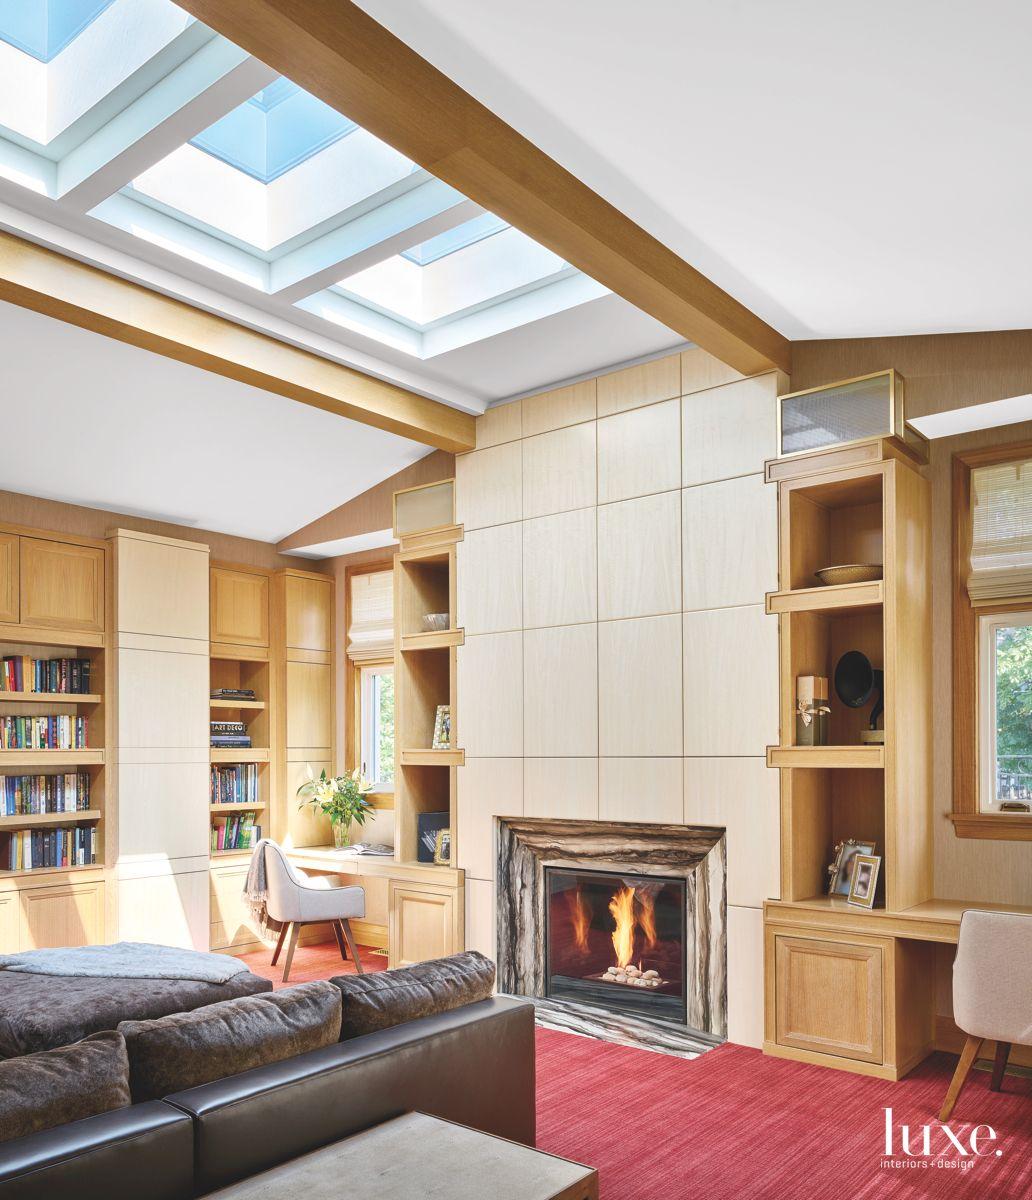 Skylight Light Wooden Den with Fireplace